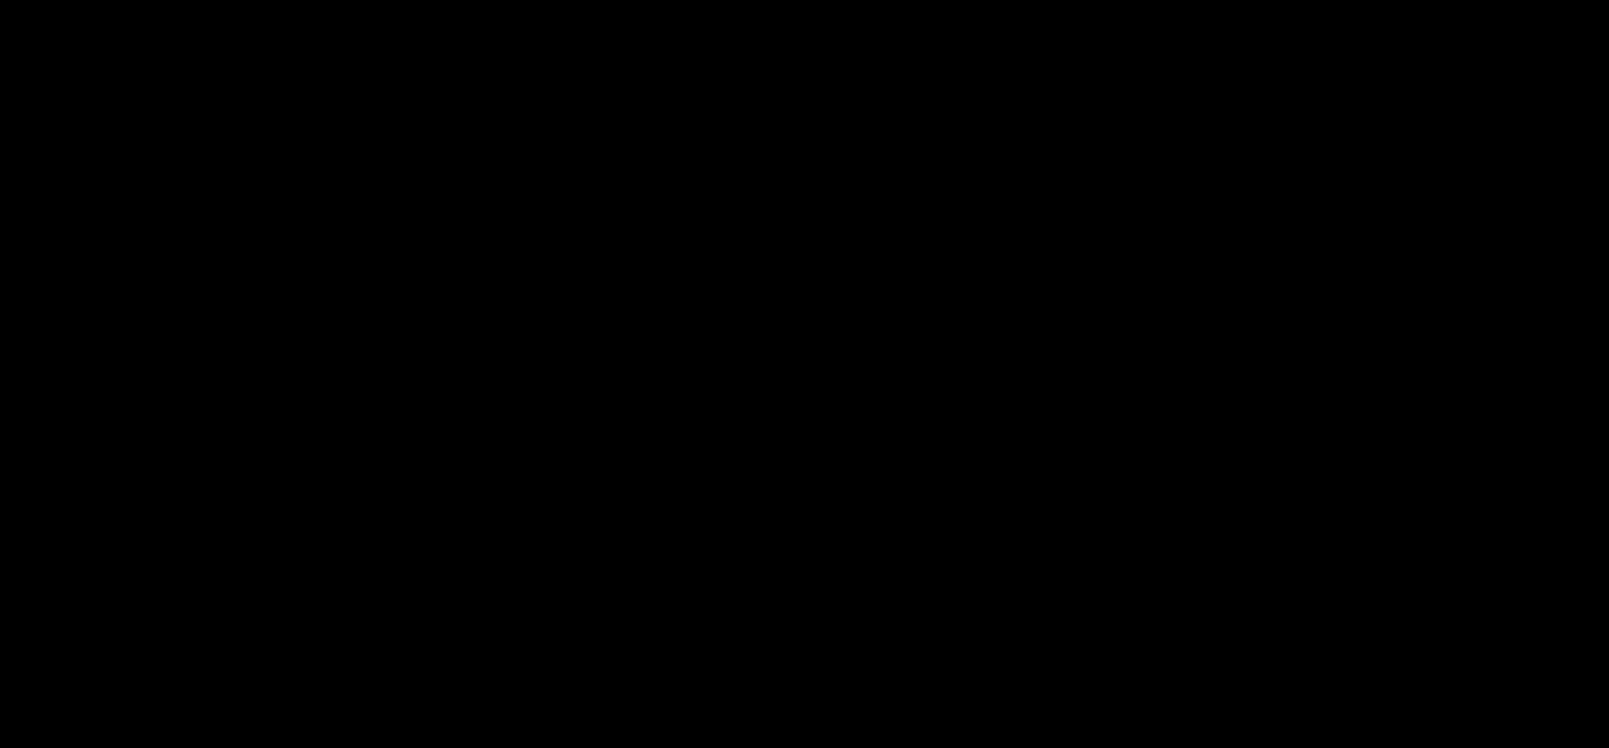 (S)-Fmoc-2-amino-5-azido-pentanoic Acid